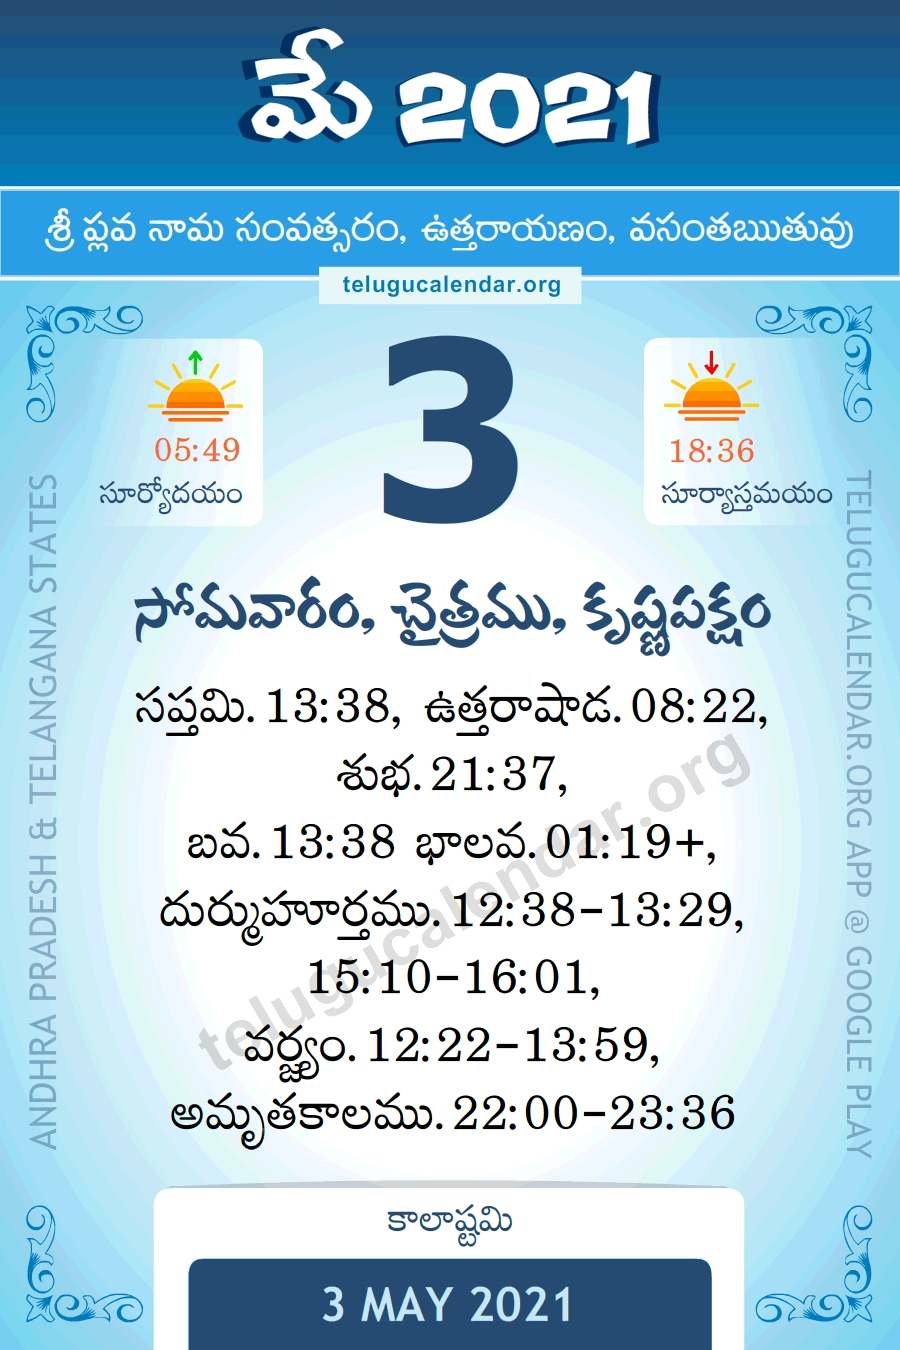 3 May 2021 Panchangam Calendar Daily In Telugu inside Telugu Calendar 2021 Panchangam Graphics